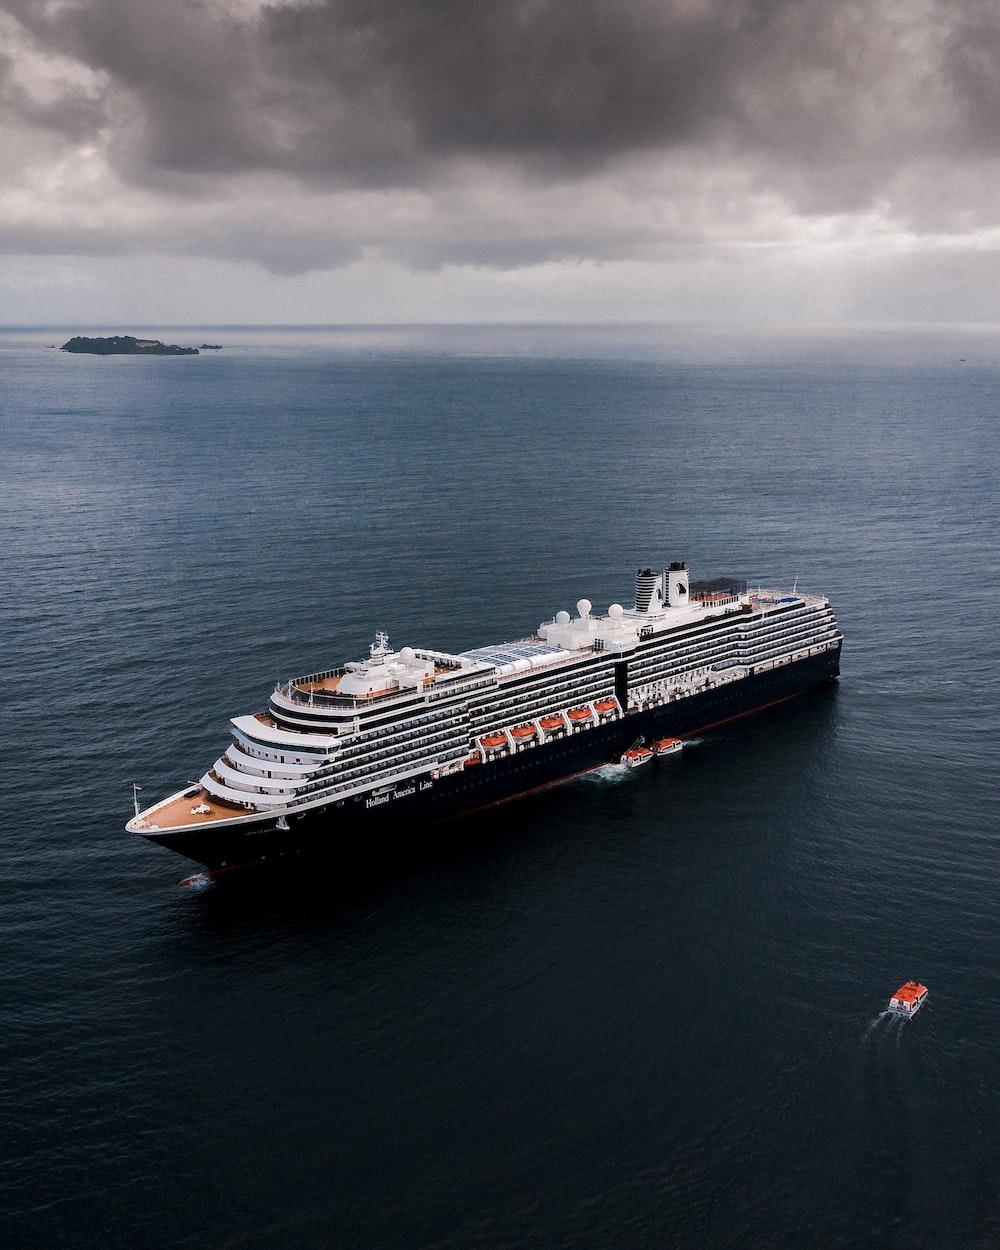 black and white cruise ship sailing on sea